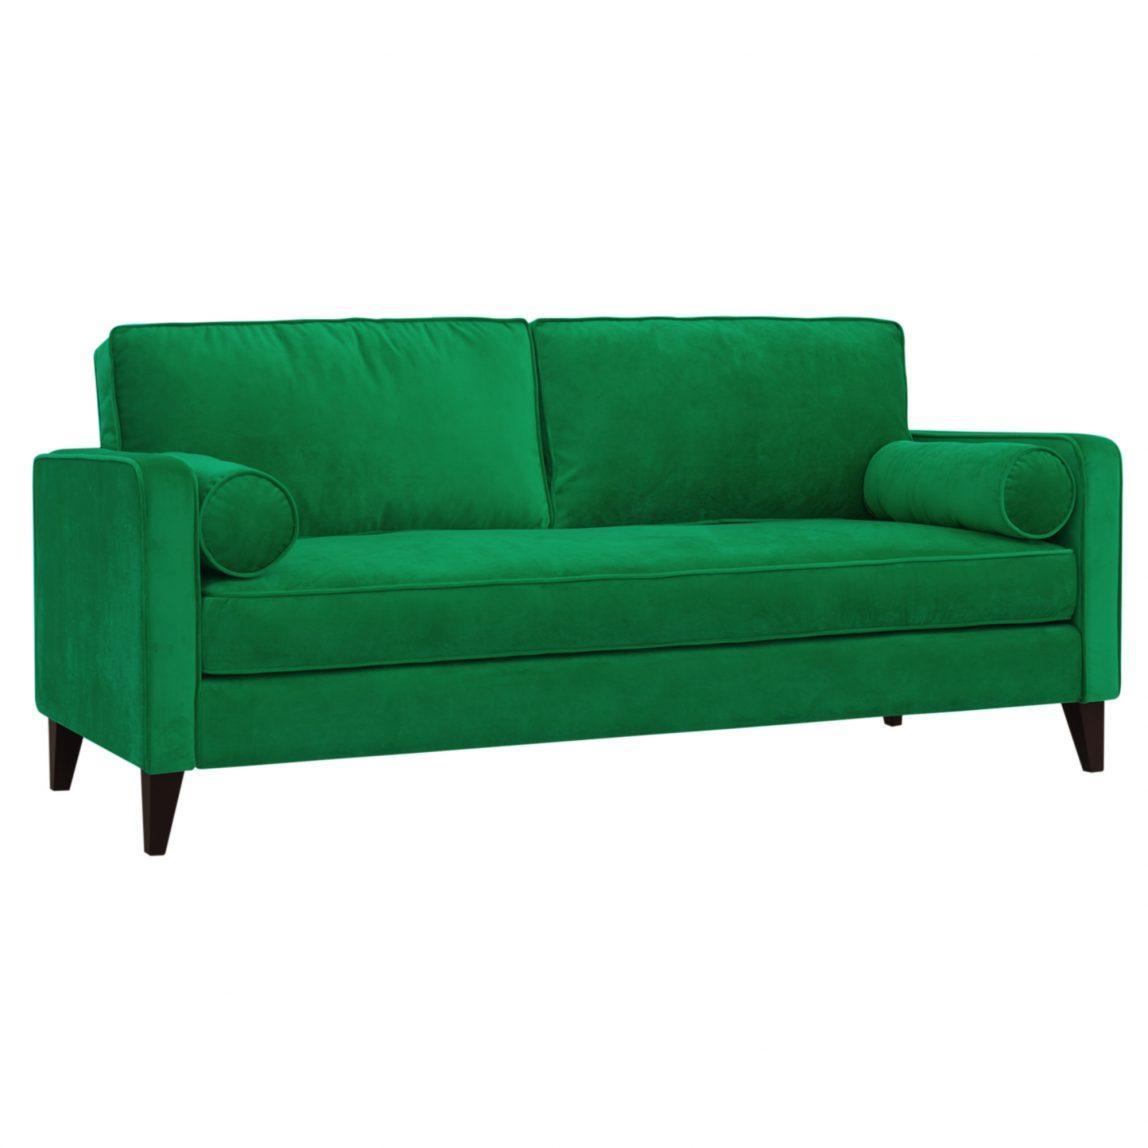 Интерьерный диван Ирвин